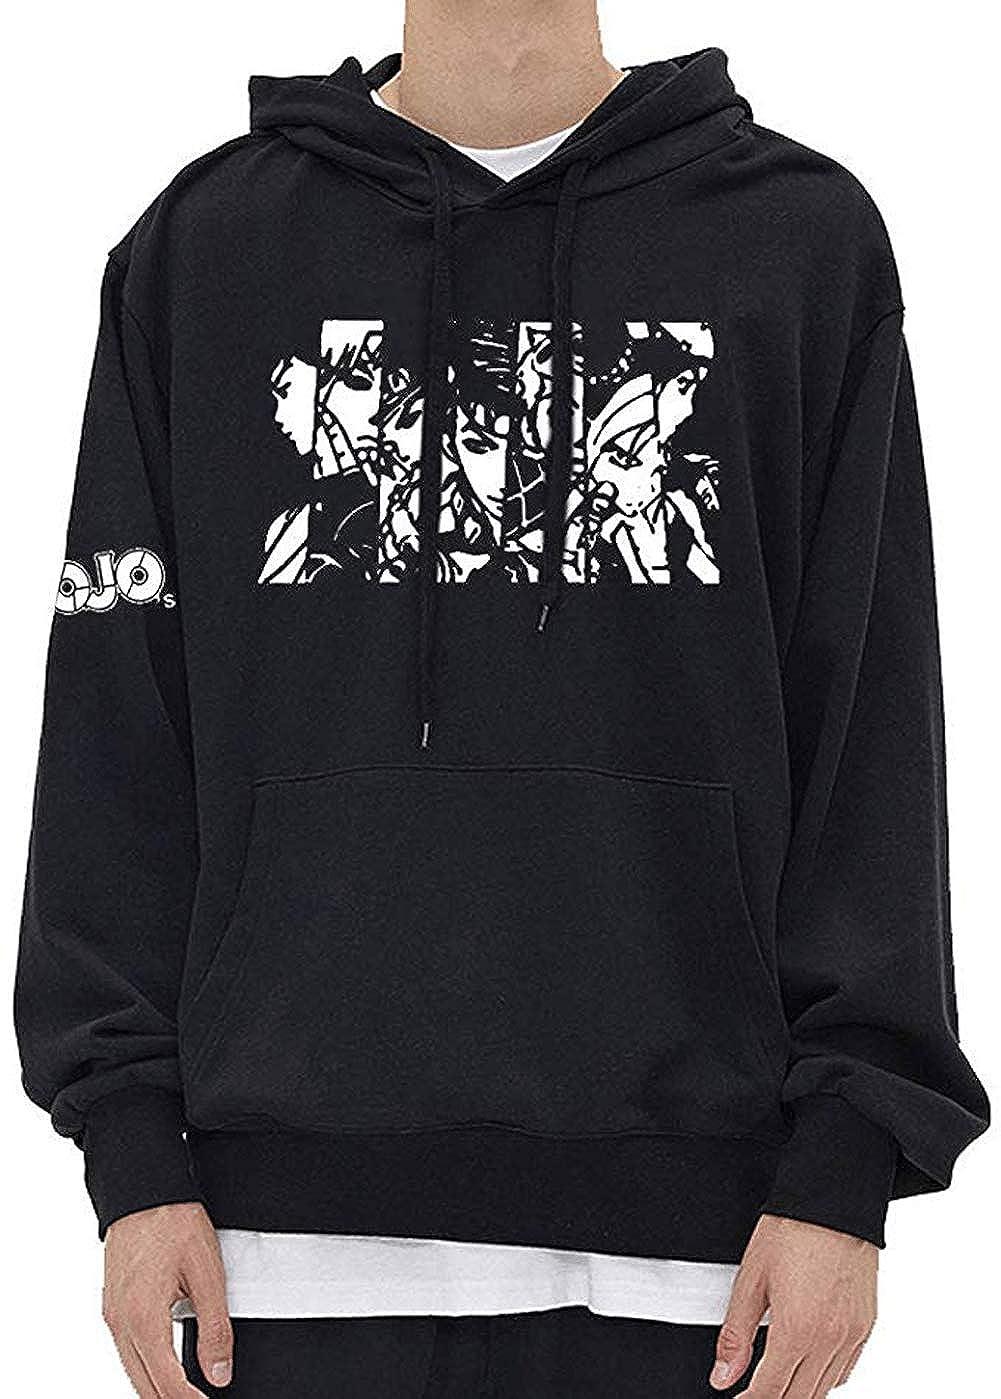 Amke JoJos Bizarre Adventure Jotaro Kujo Hooded Sweater Printed Kujo Jotaro Hoodie Coat